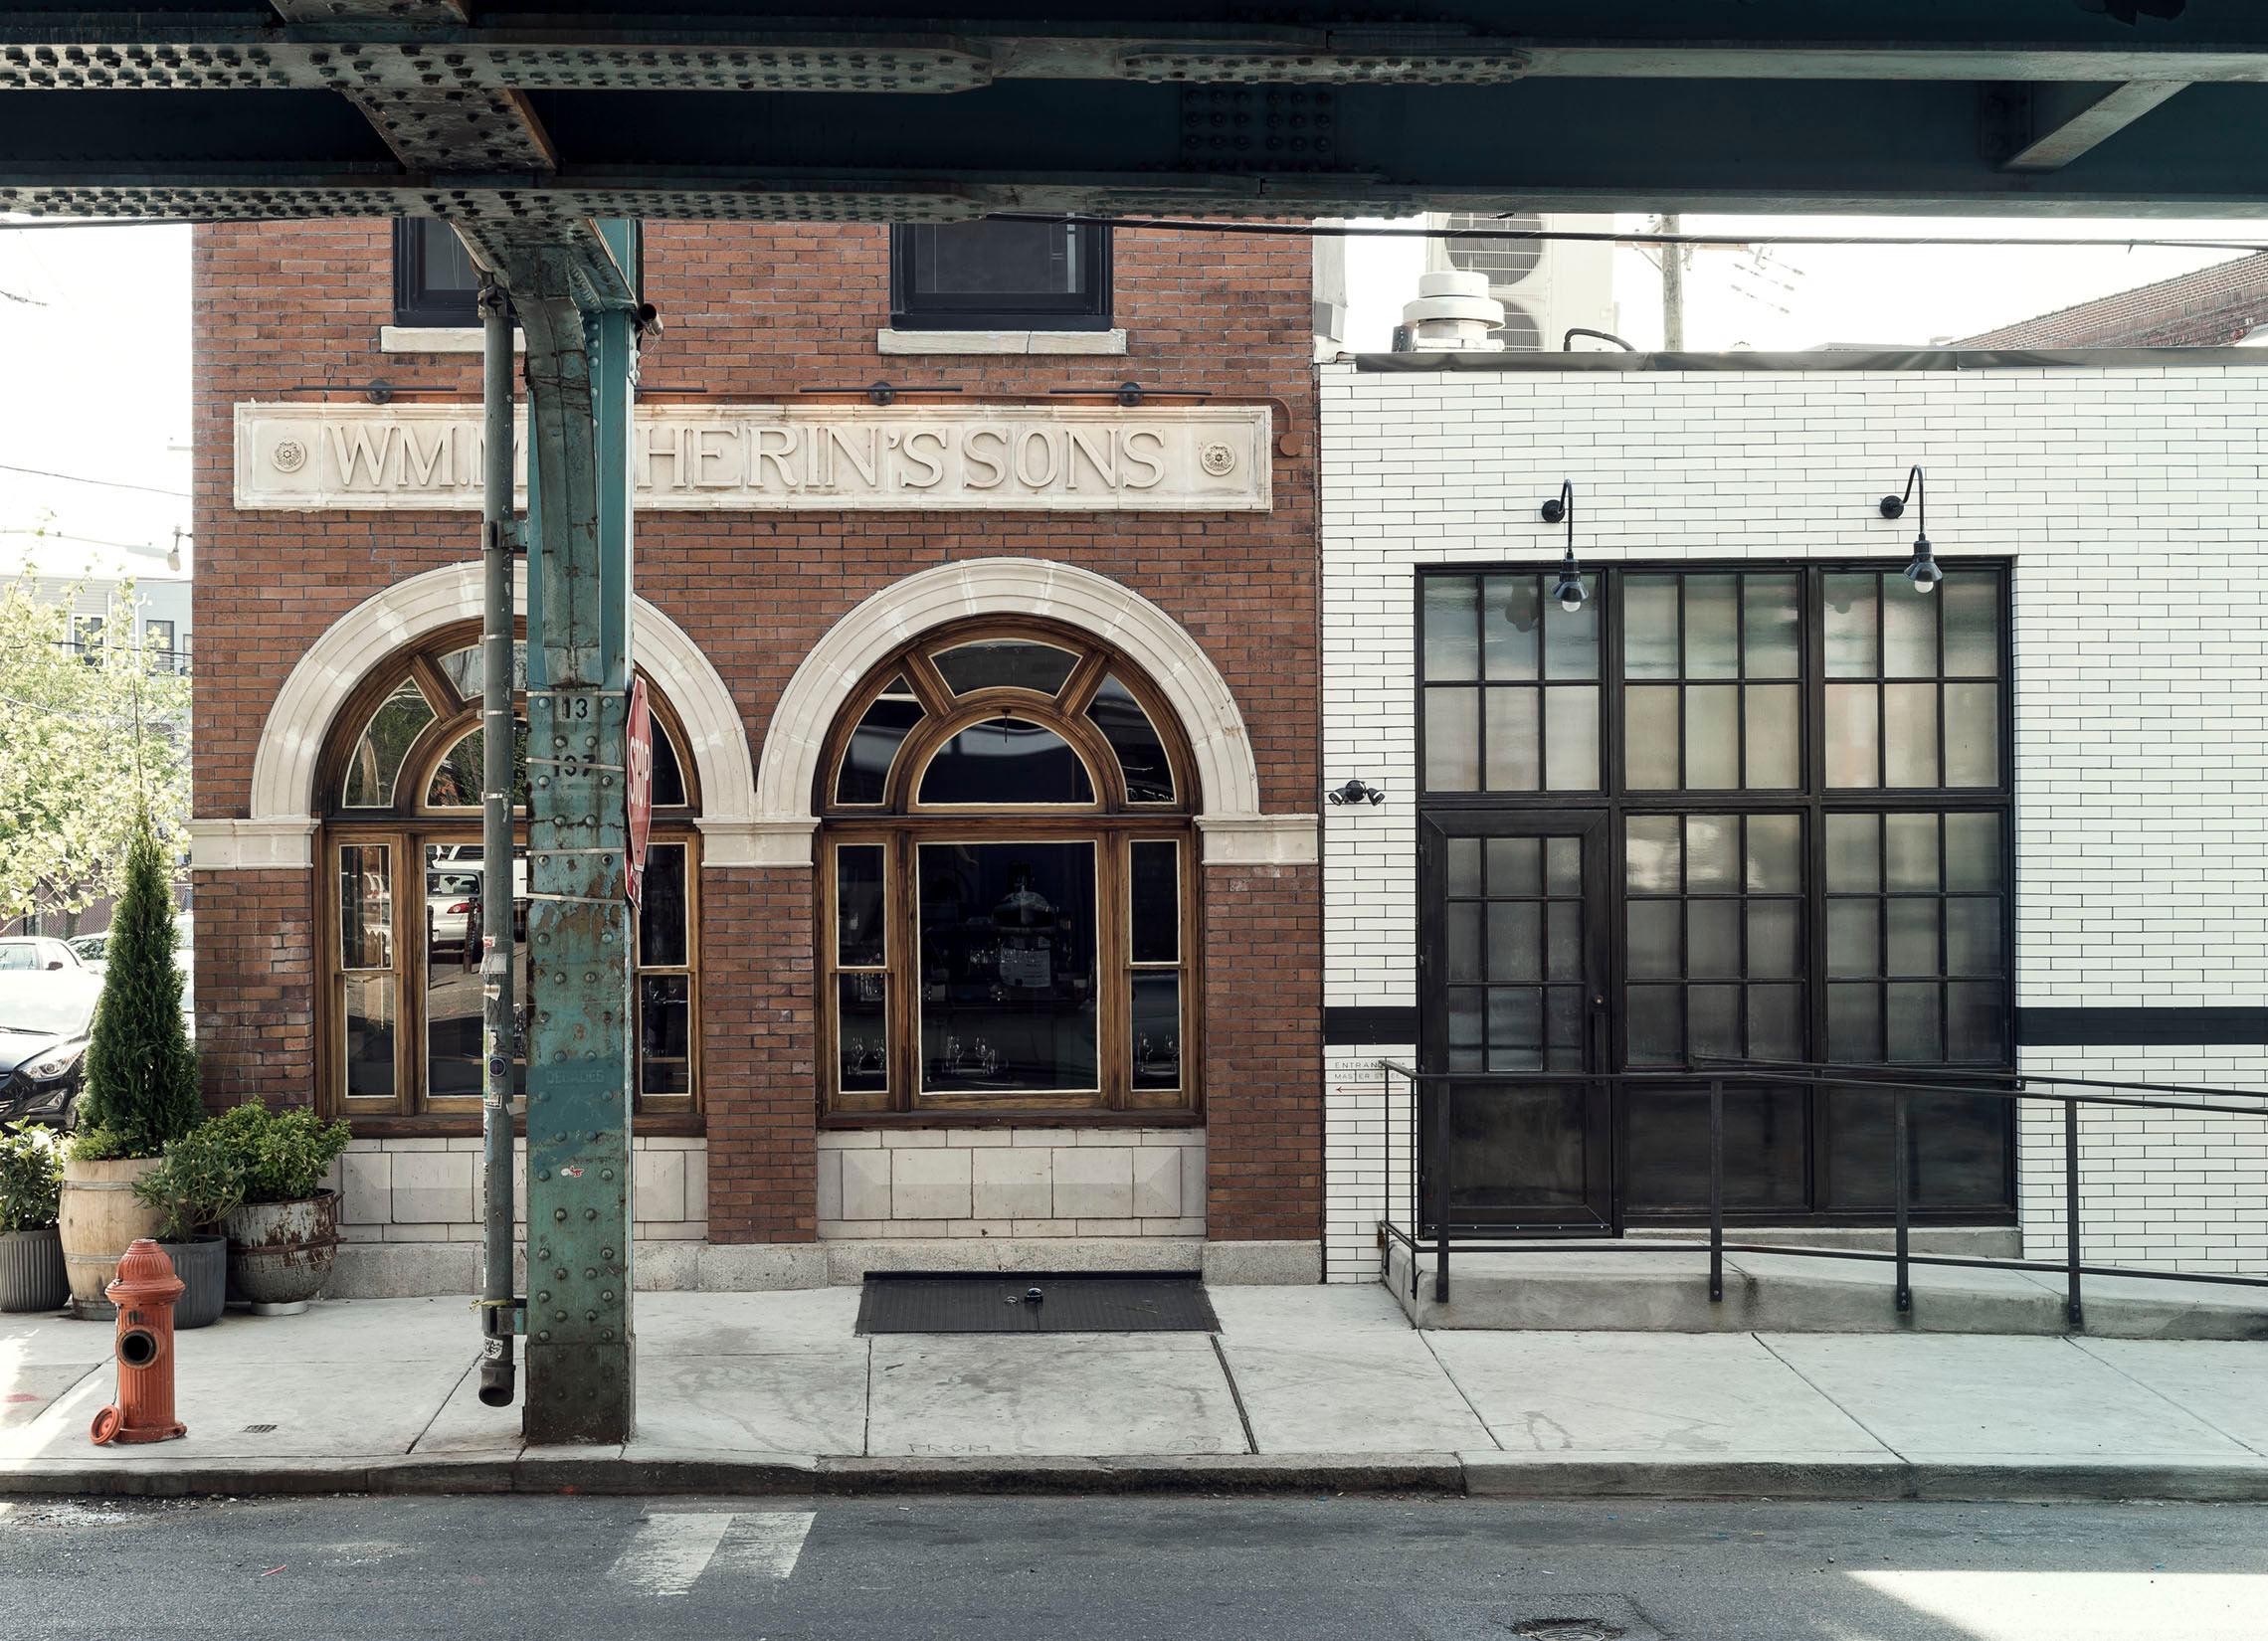 Wm.-Mulherins-Sons---Exterior-x-Front-Street---by-Matthew-Williams.jpg